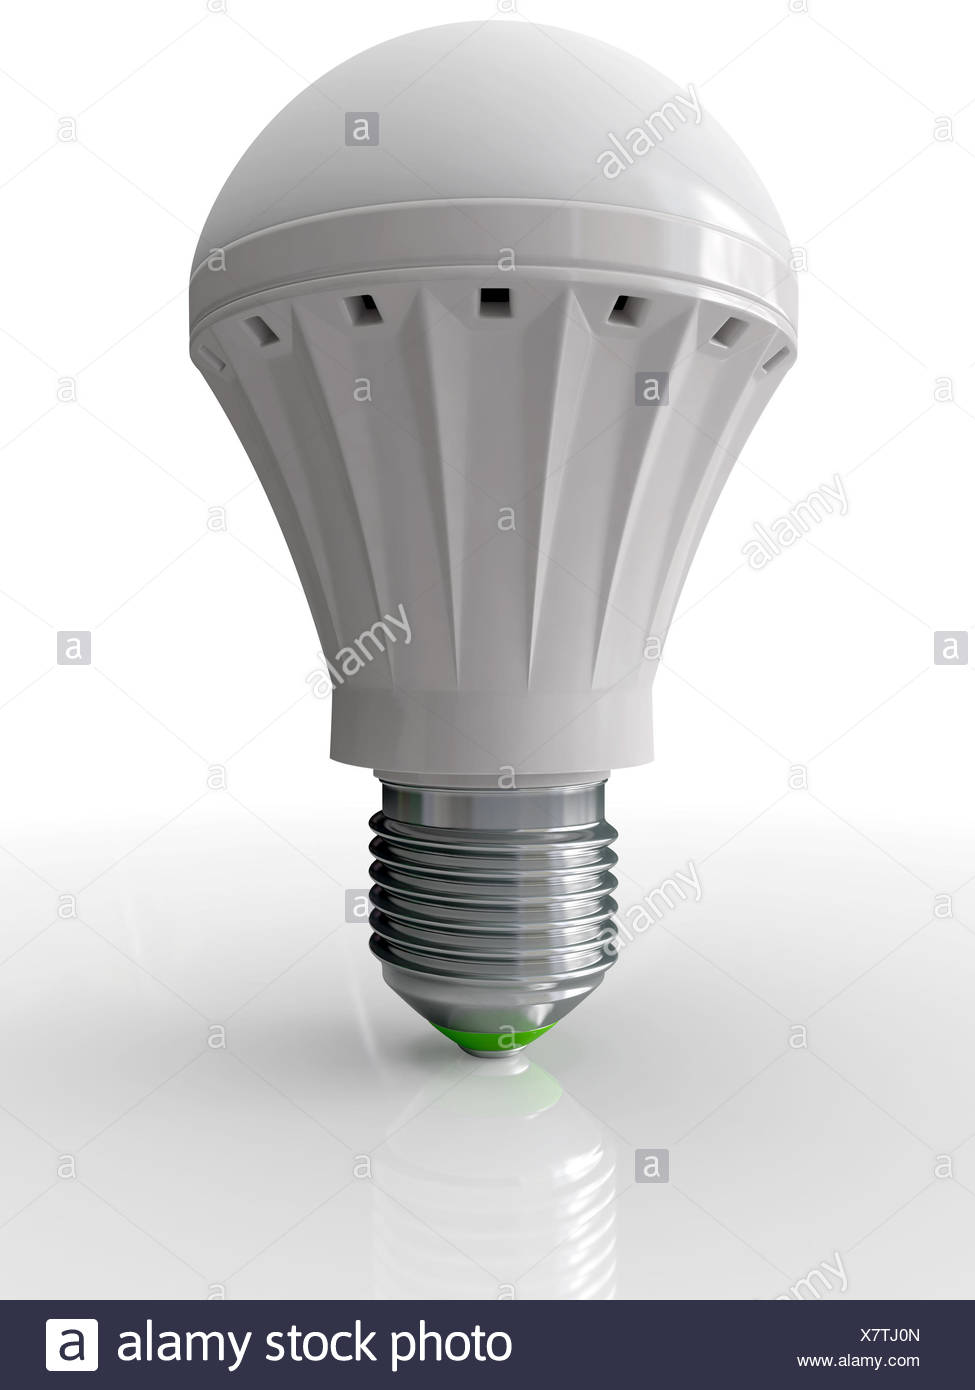 Modern bulb for illumination - Stock Image